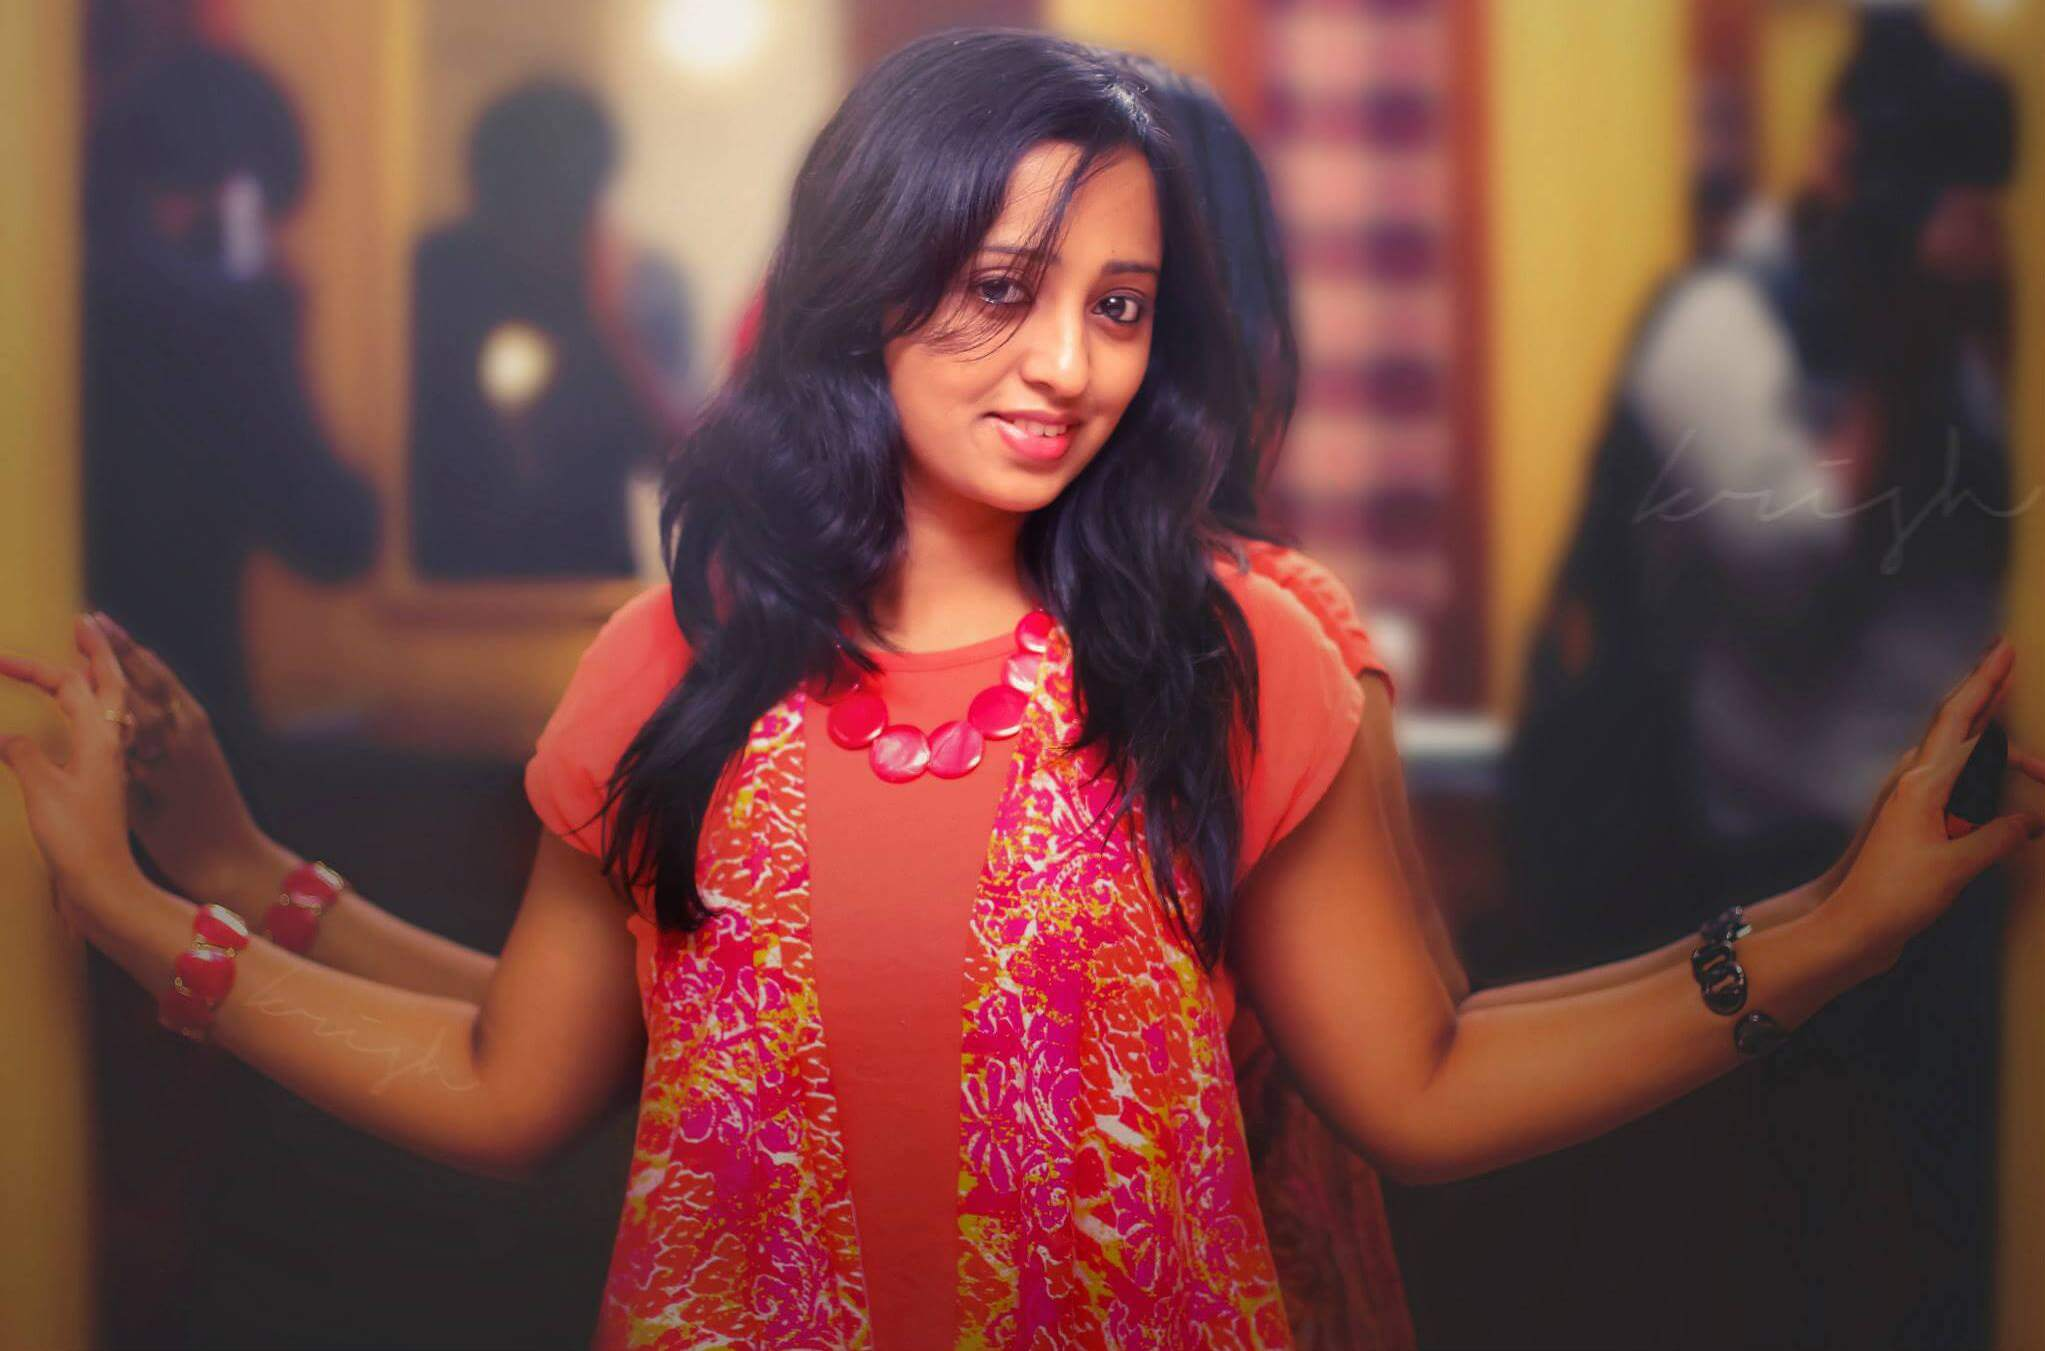 Singer Malavika Images